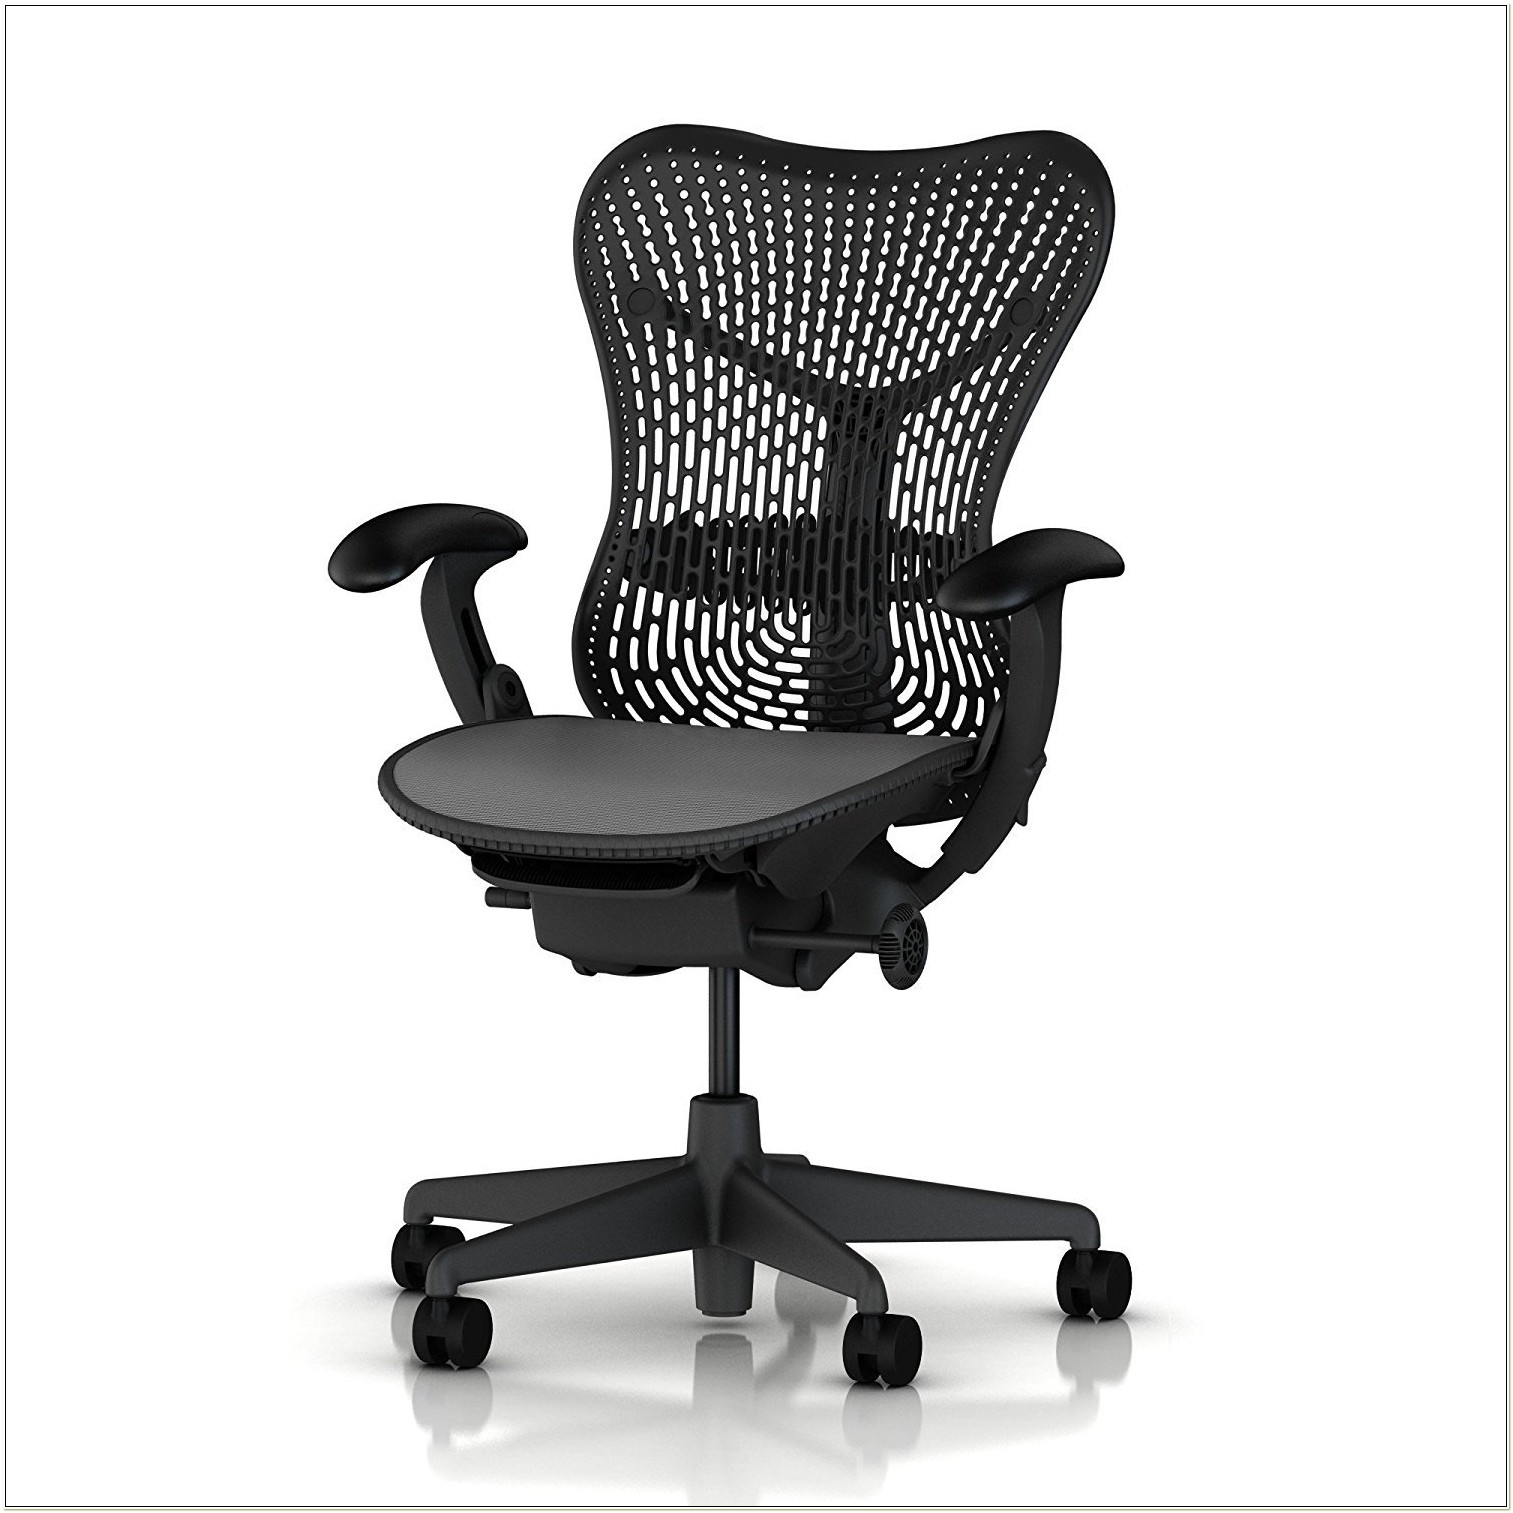 Herman Miller Mirra Chair Sizes